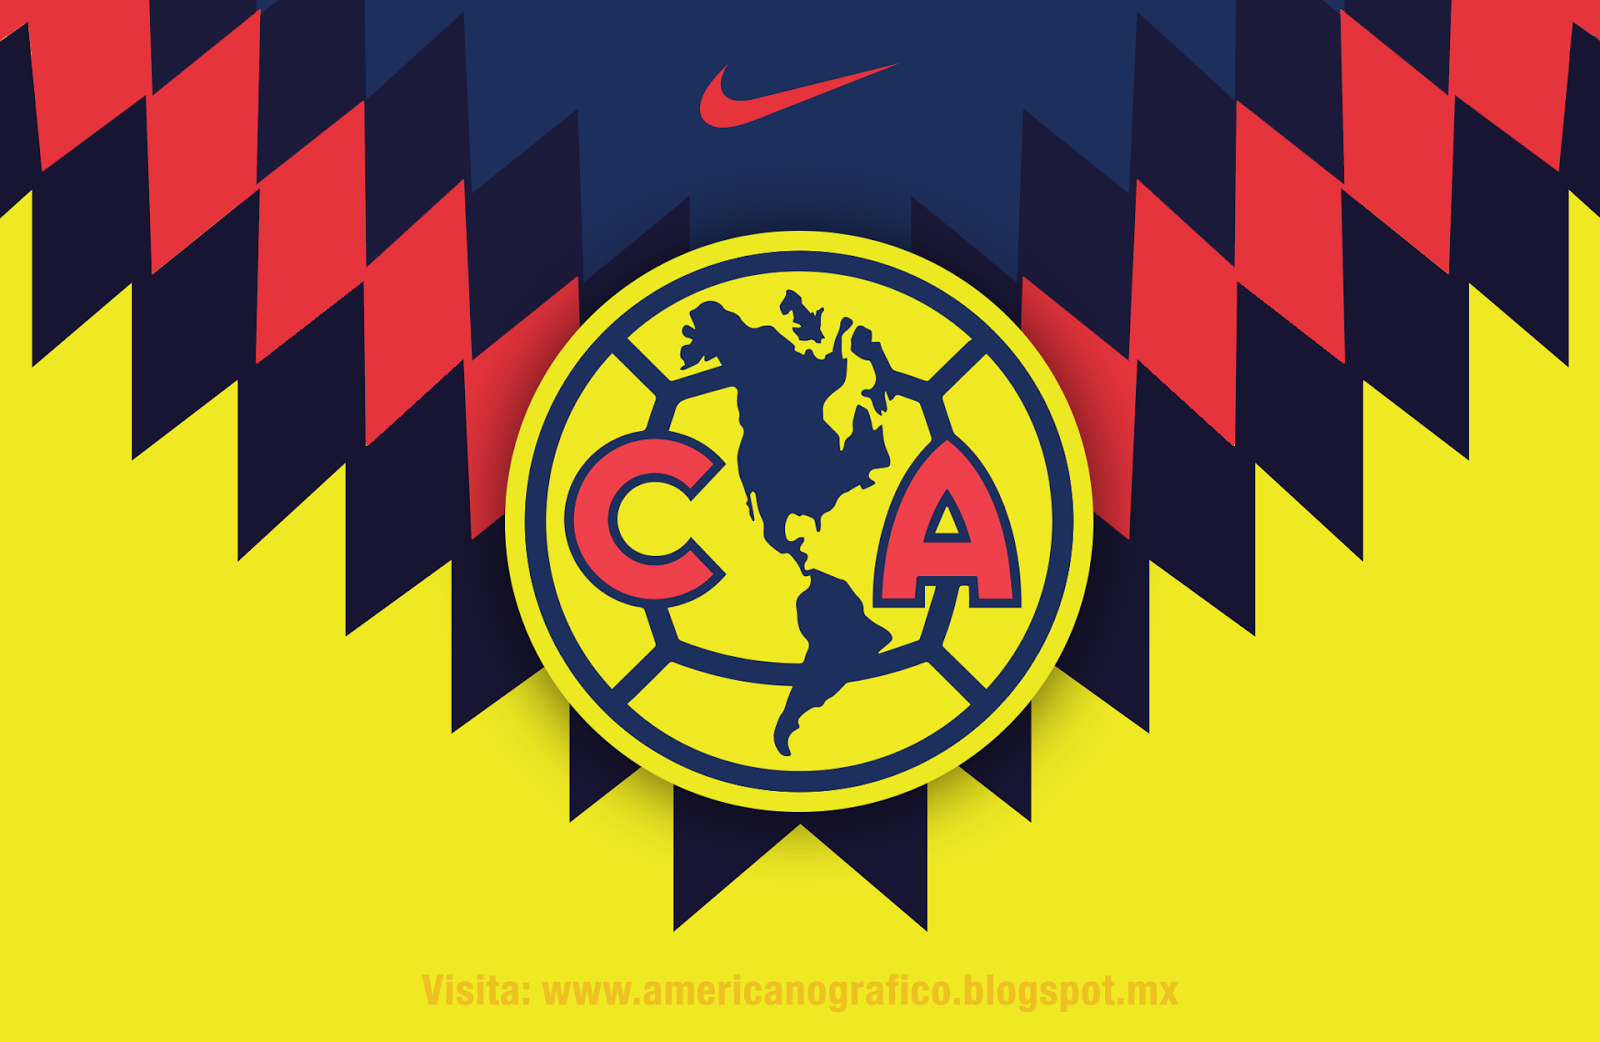 Club America 140617 Png 1600 1042 Club America Messi Vs Messi Vs Ronaldo